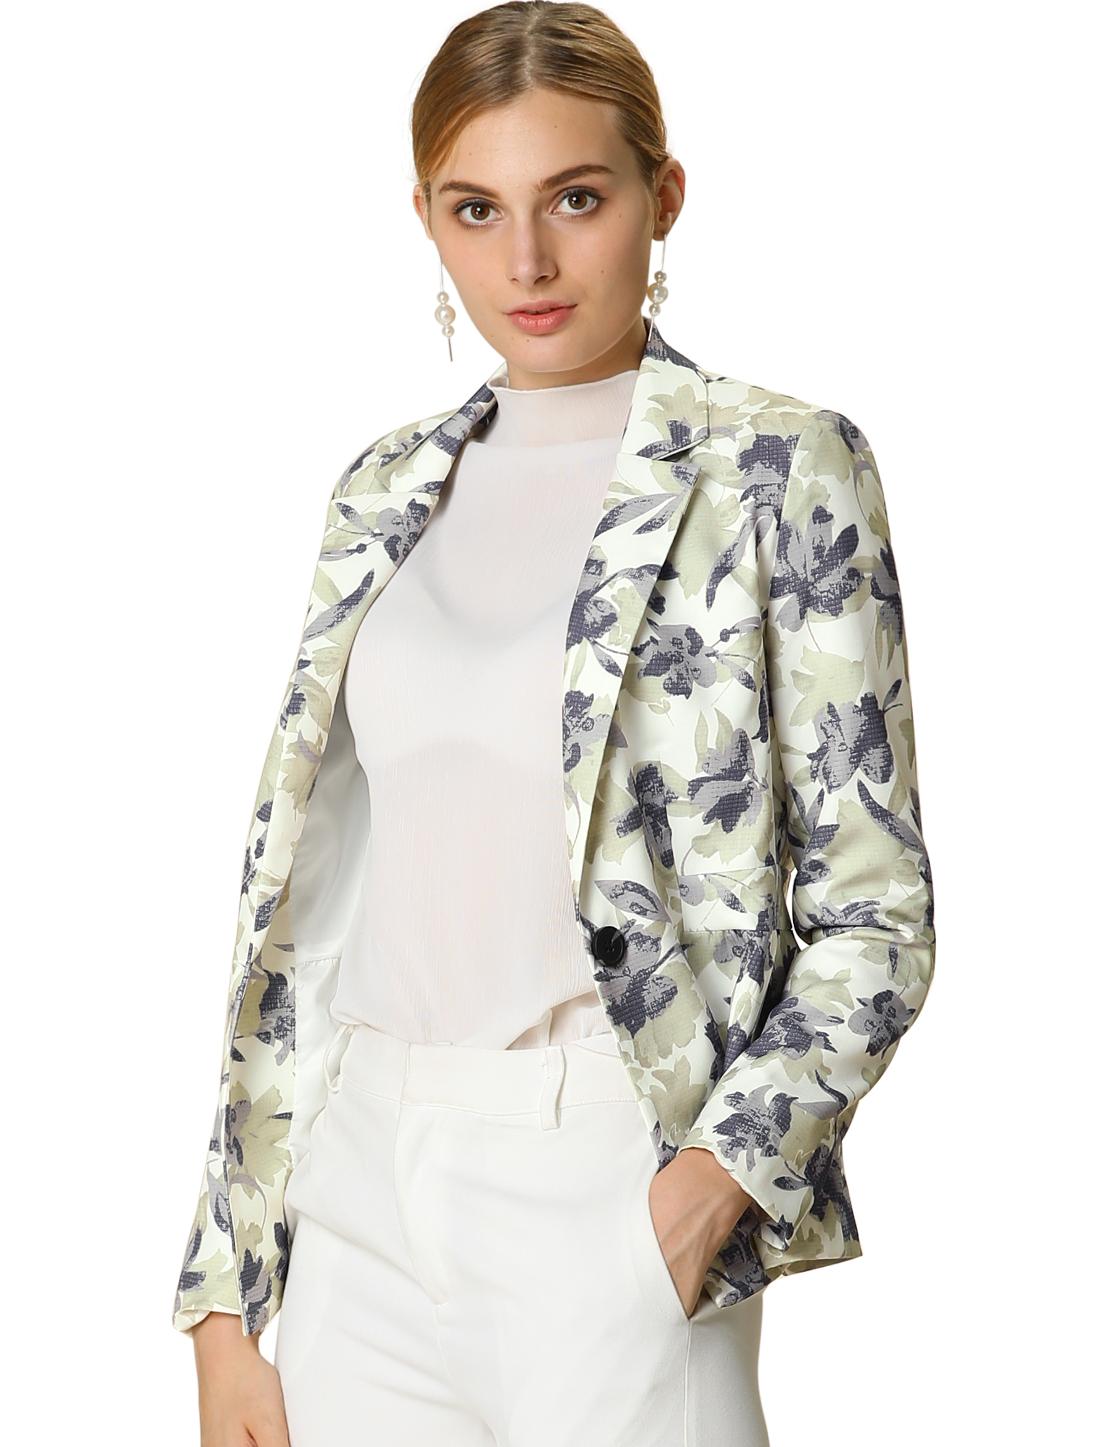 Women's Floral Print One Button Notched Lapel Blazer Jacket White S